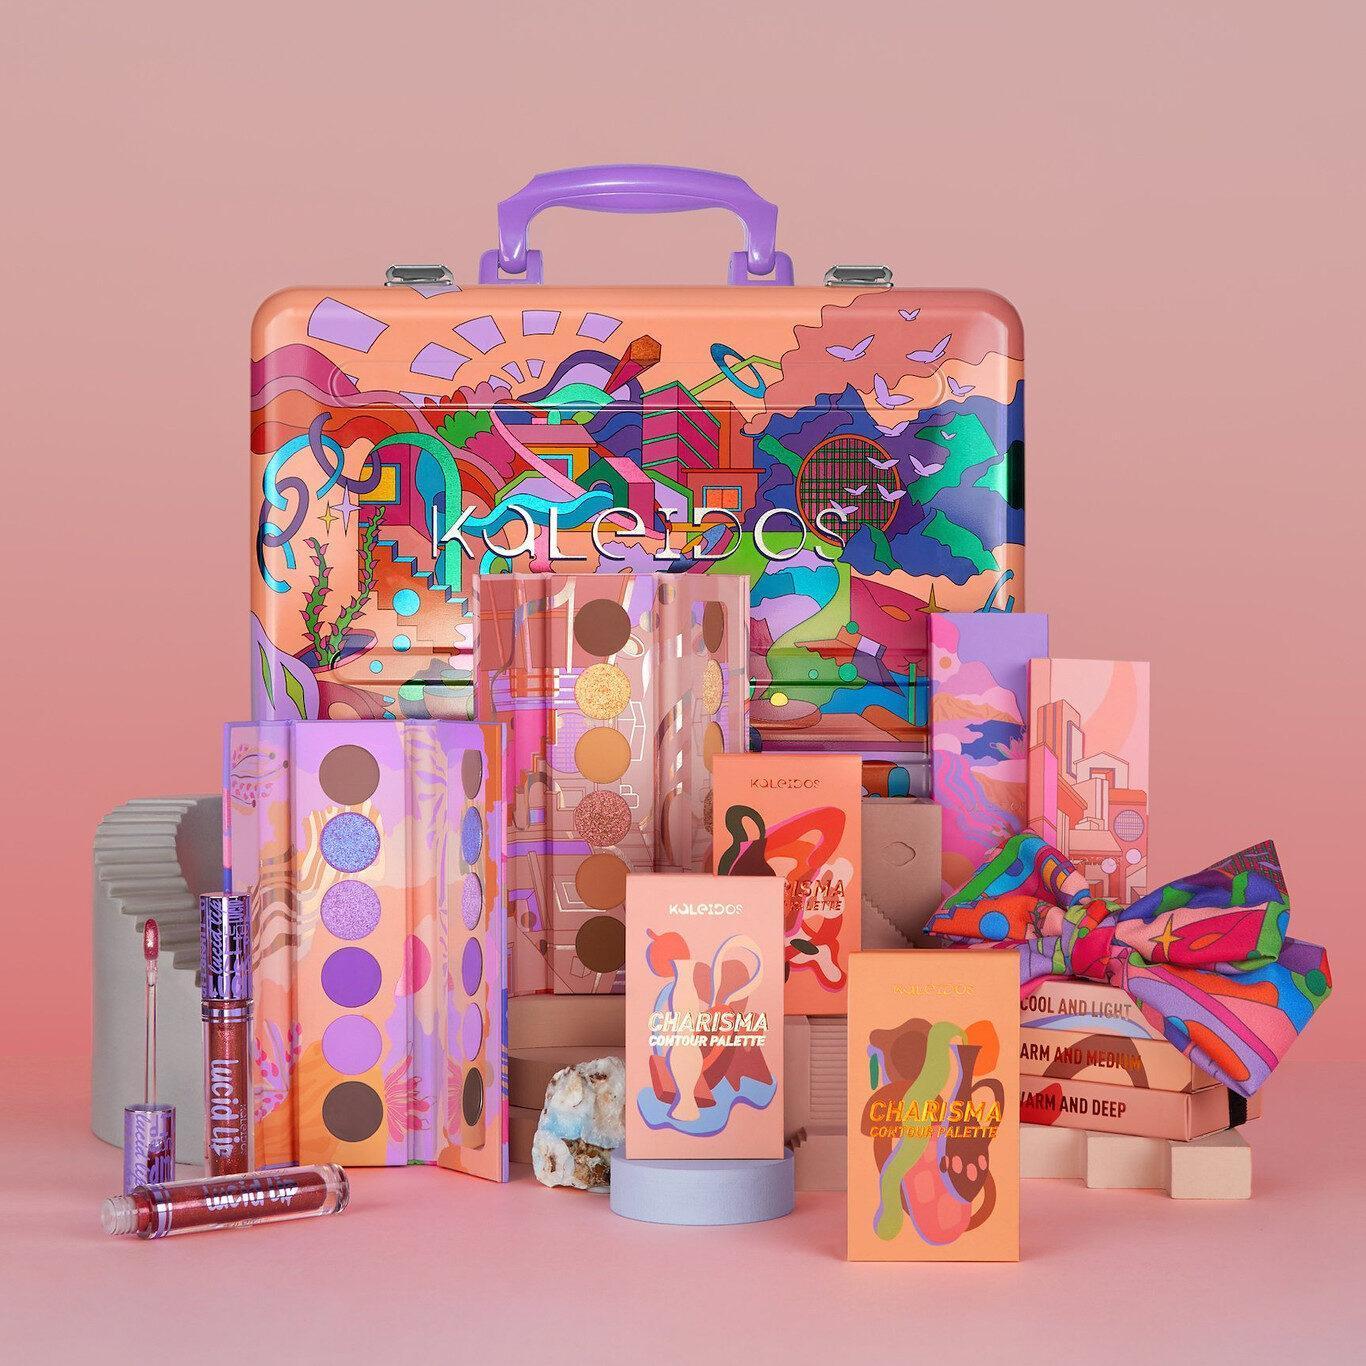 Kaleidos Makeup The Fresh Fantasy Collection Full Collection PR Kit